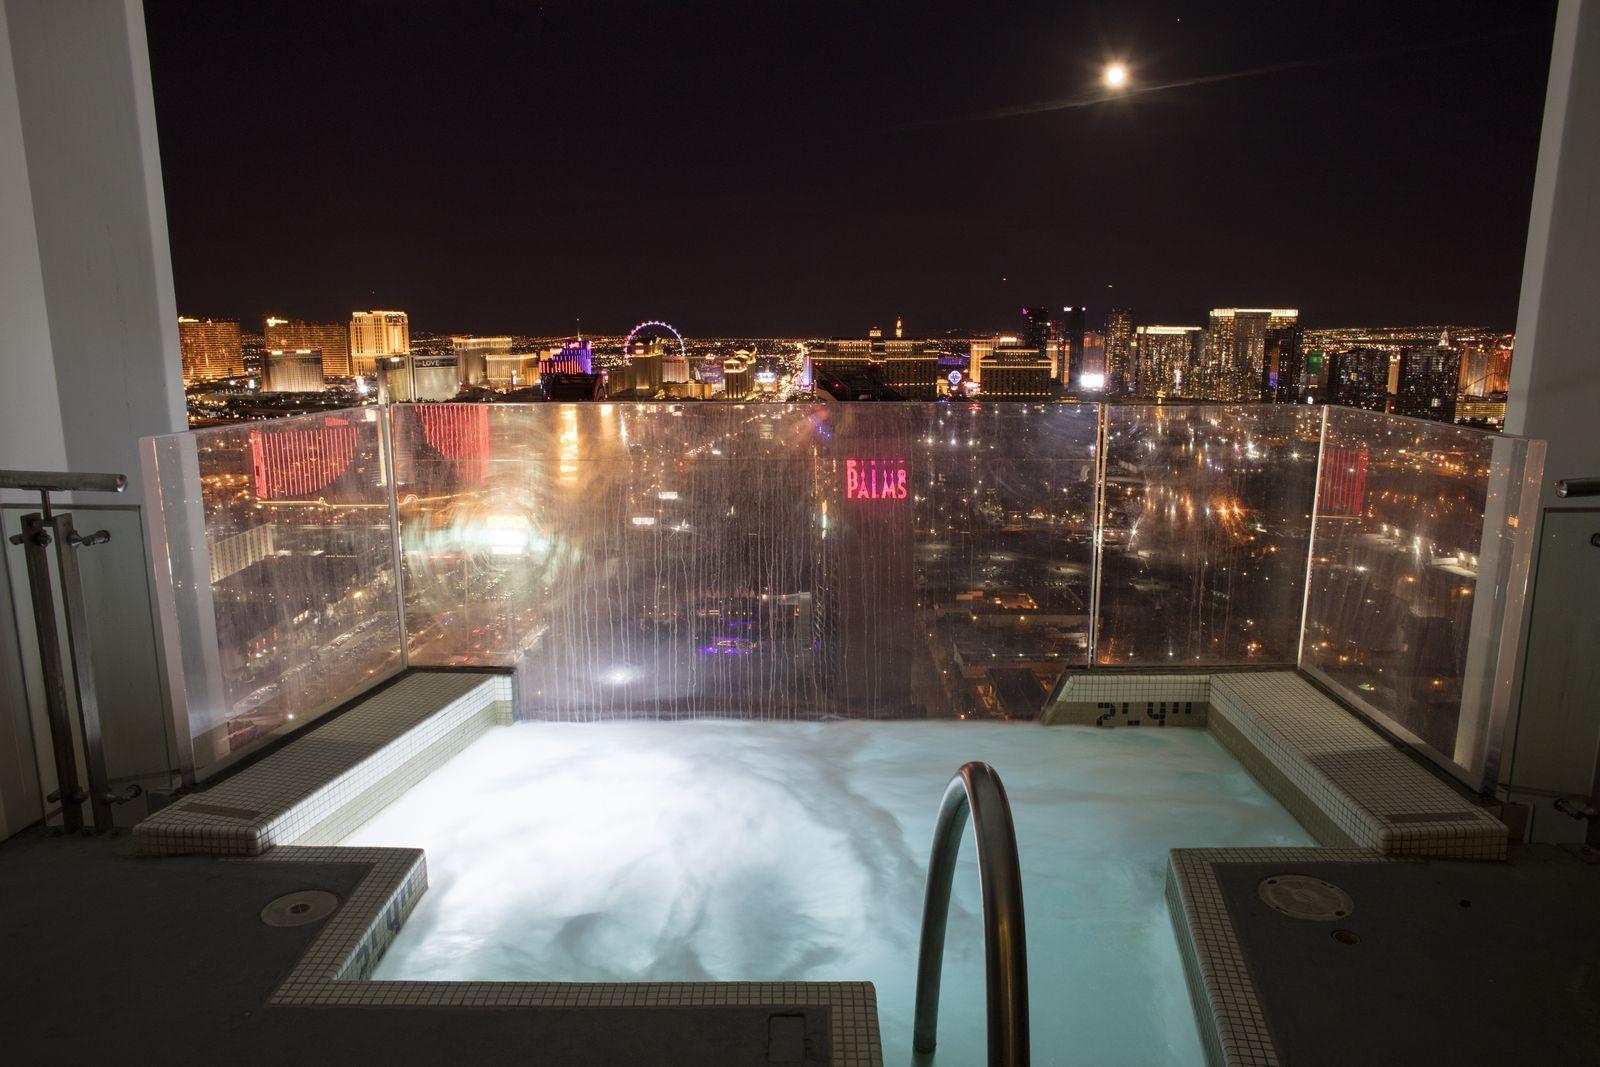 Las Vegas Pauschalreise - 936527